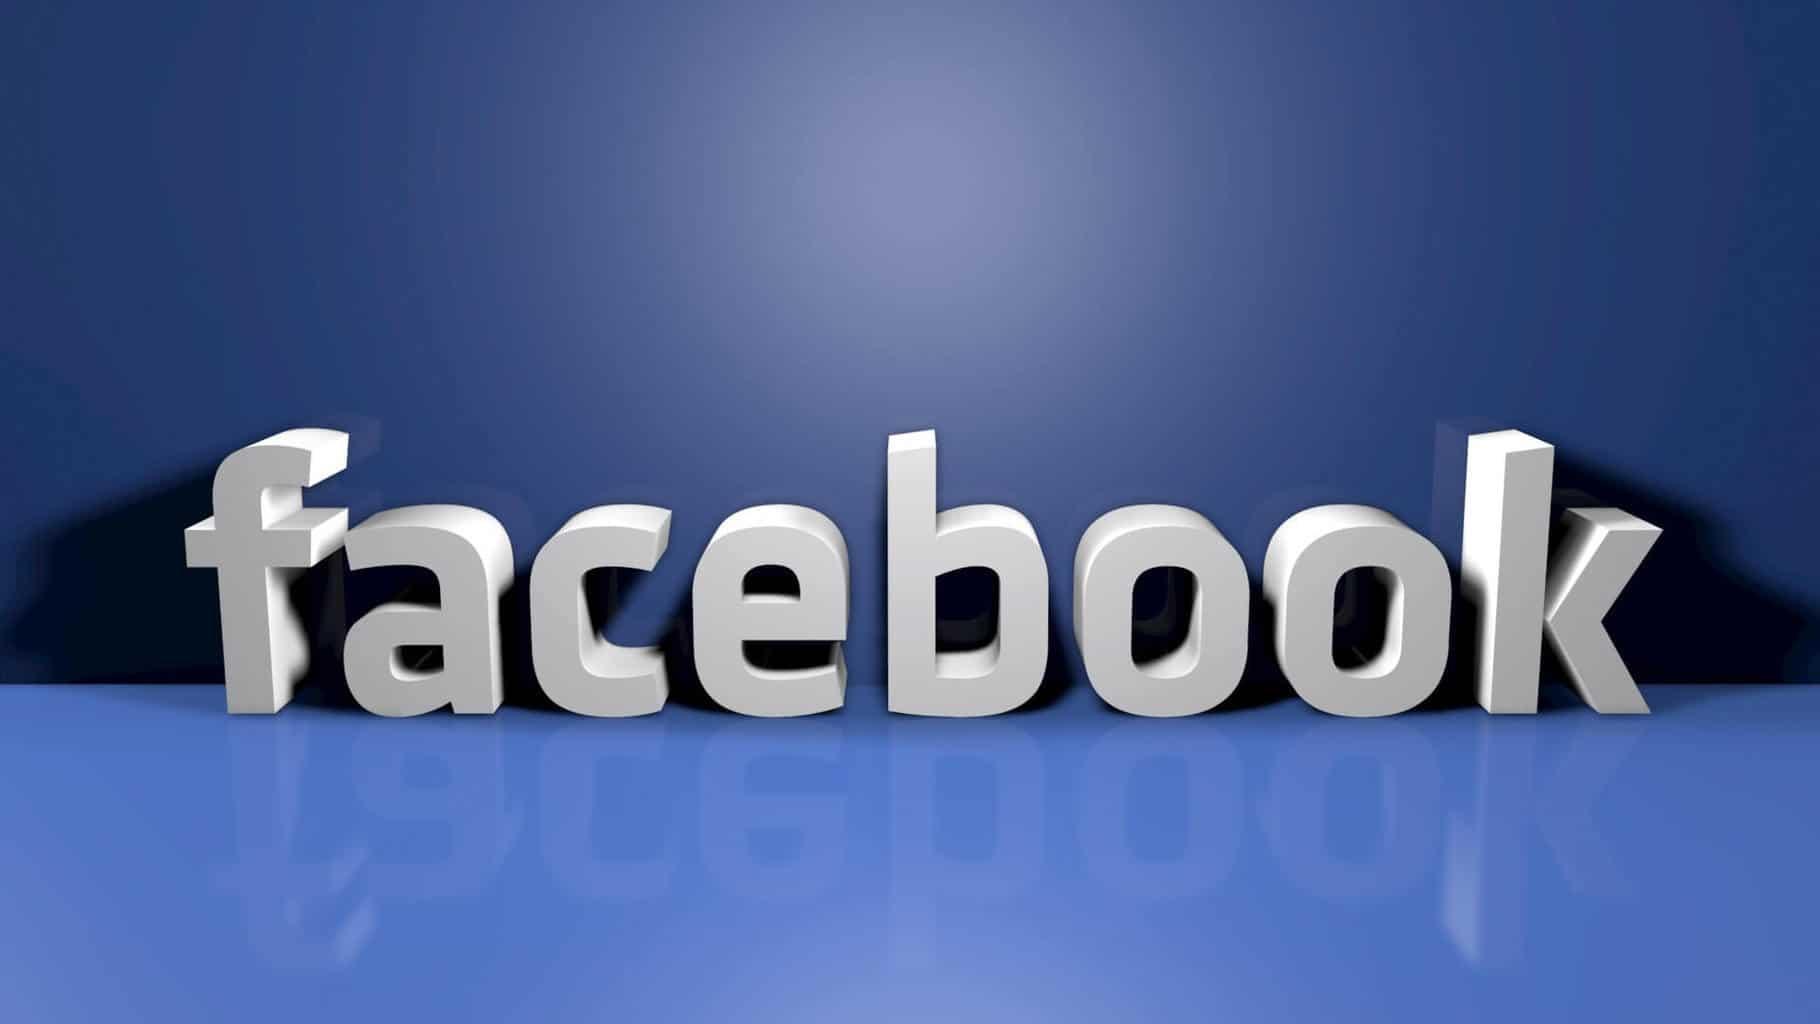 Facebook's Instagram Working on A New Messaging App